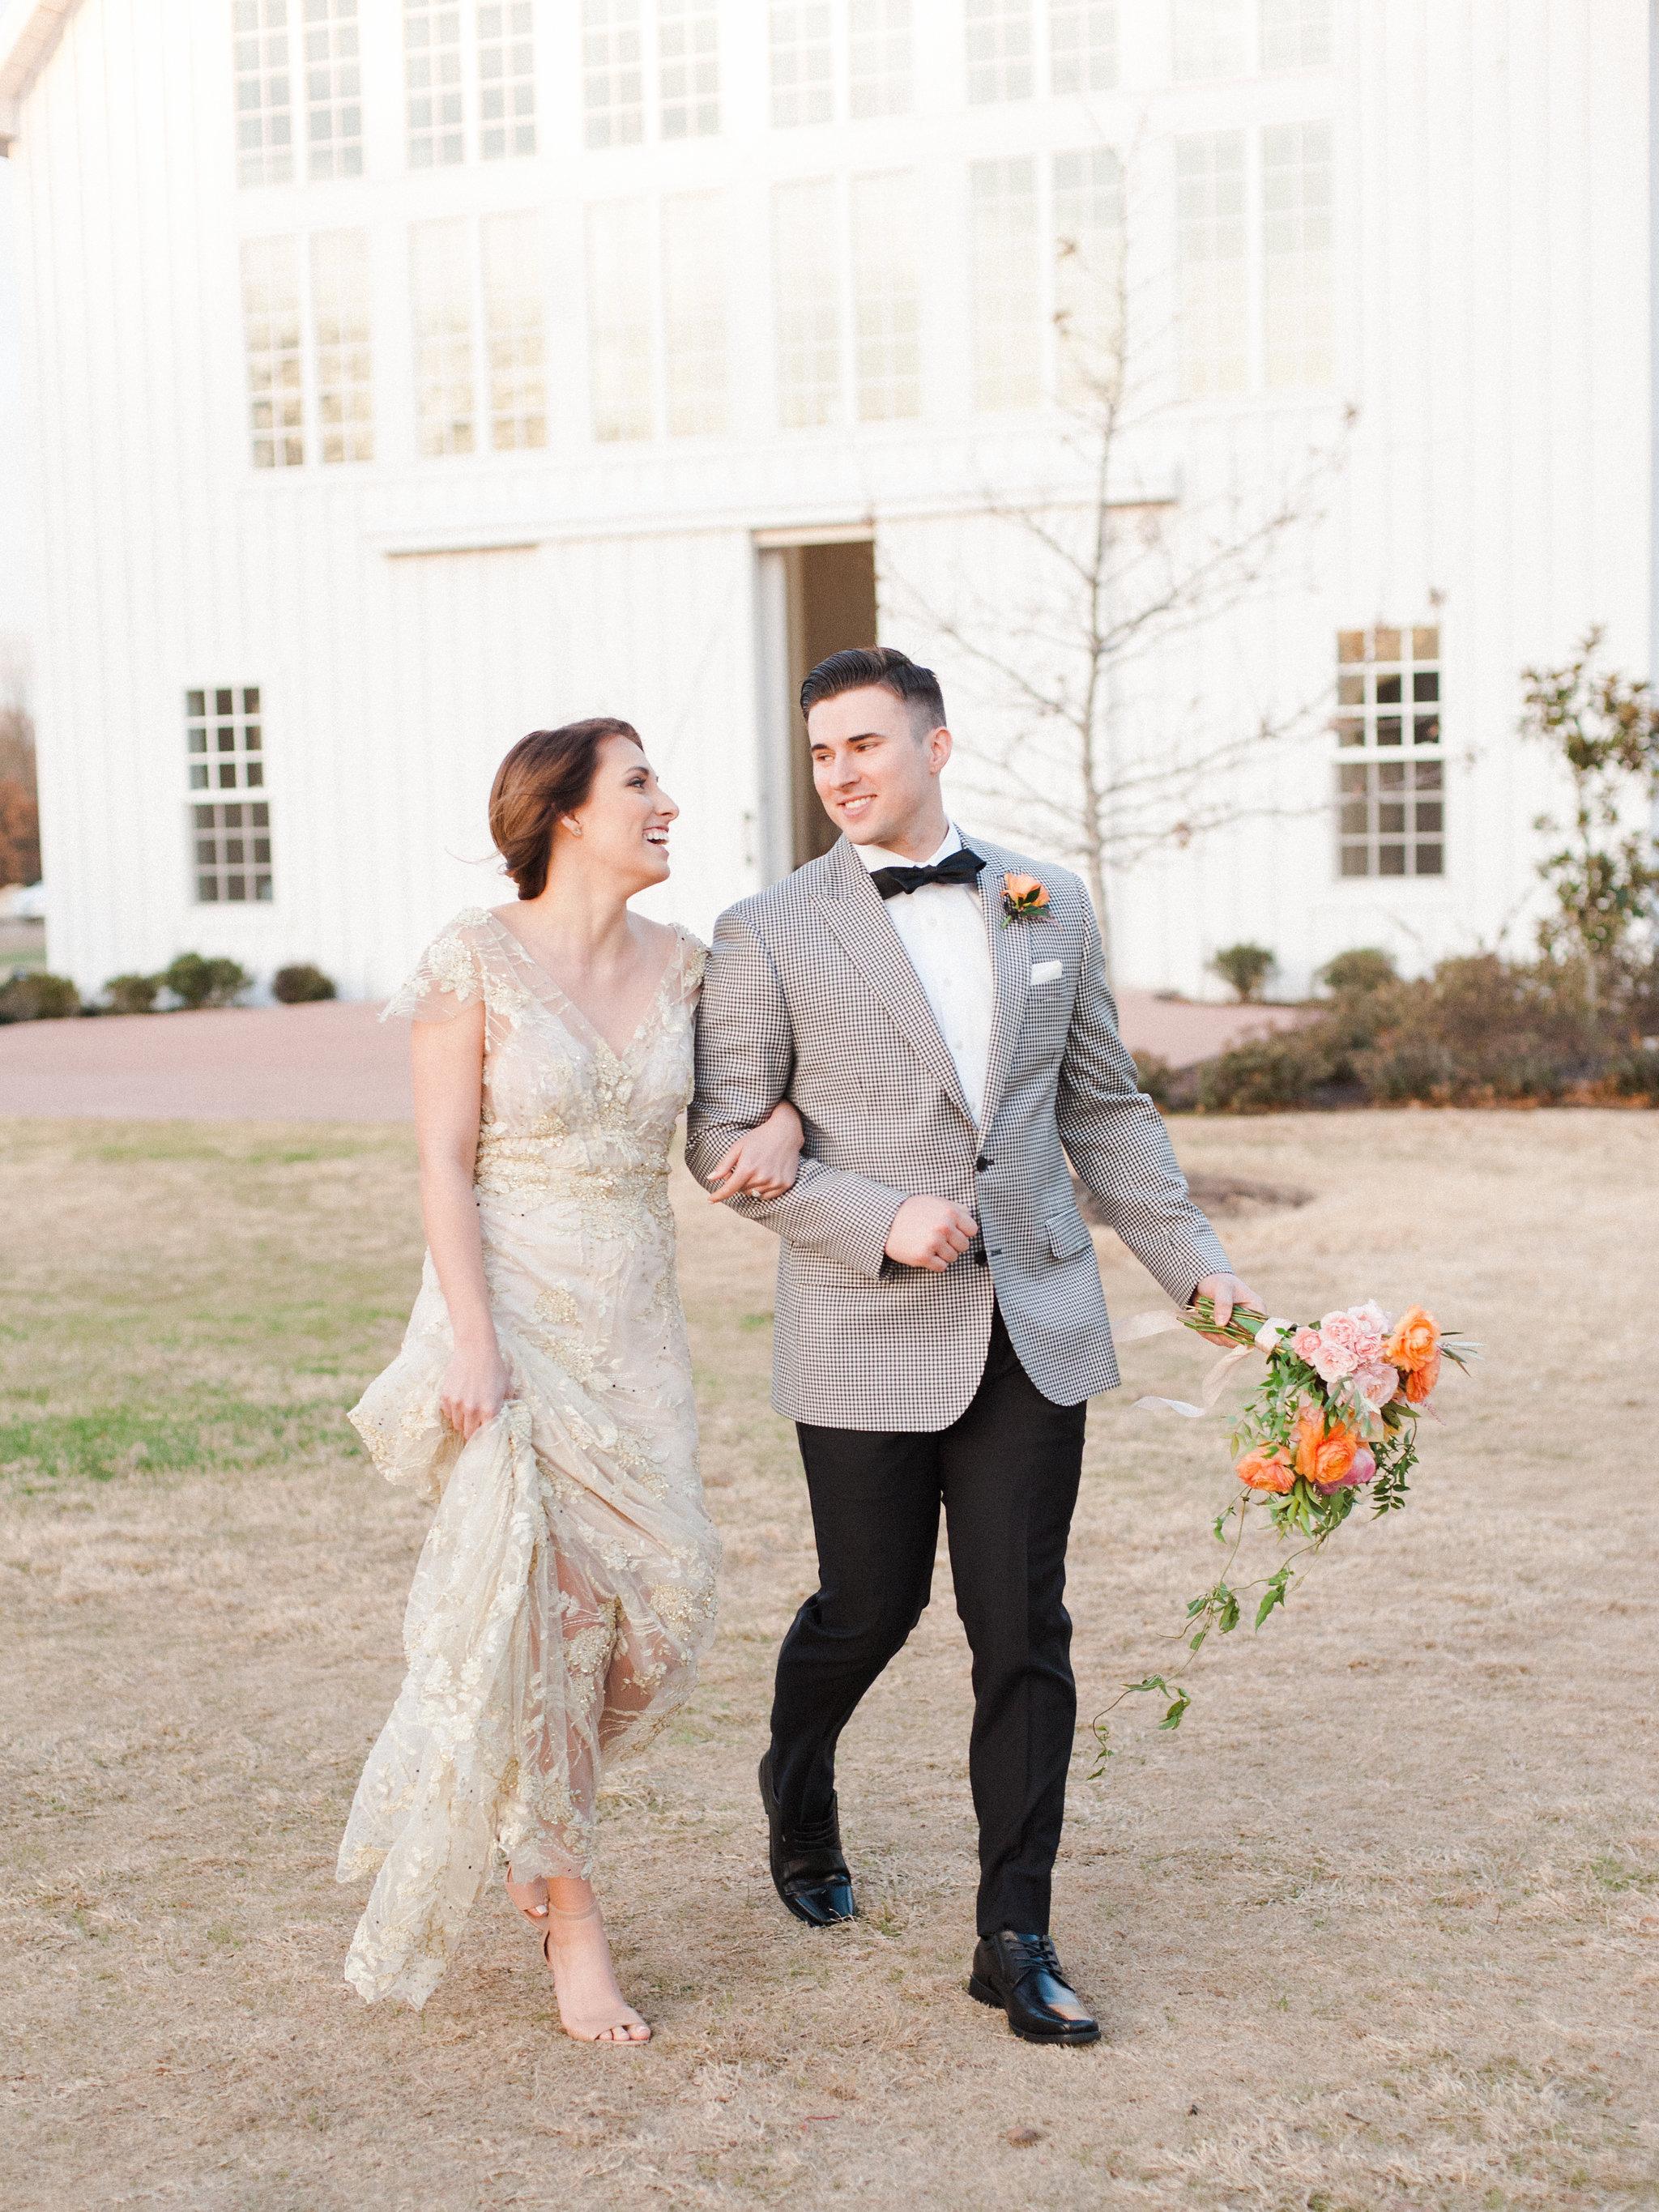 gossamer-wedding-dress